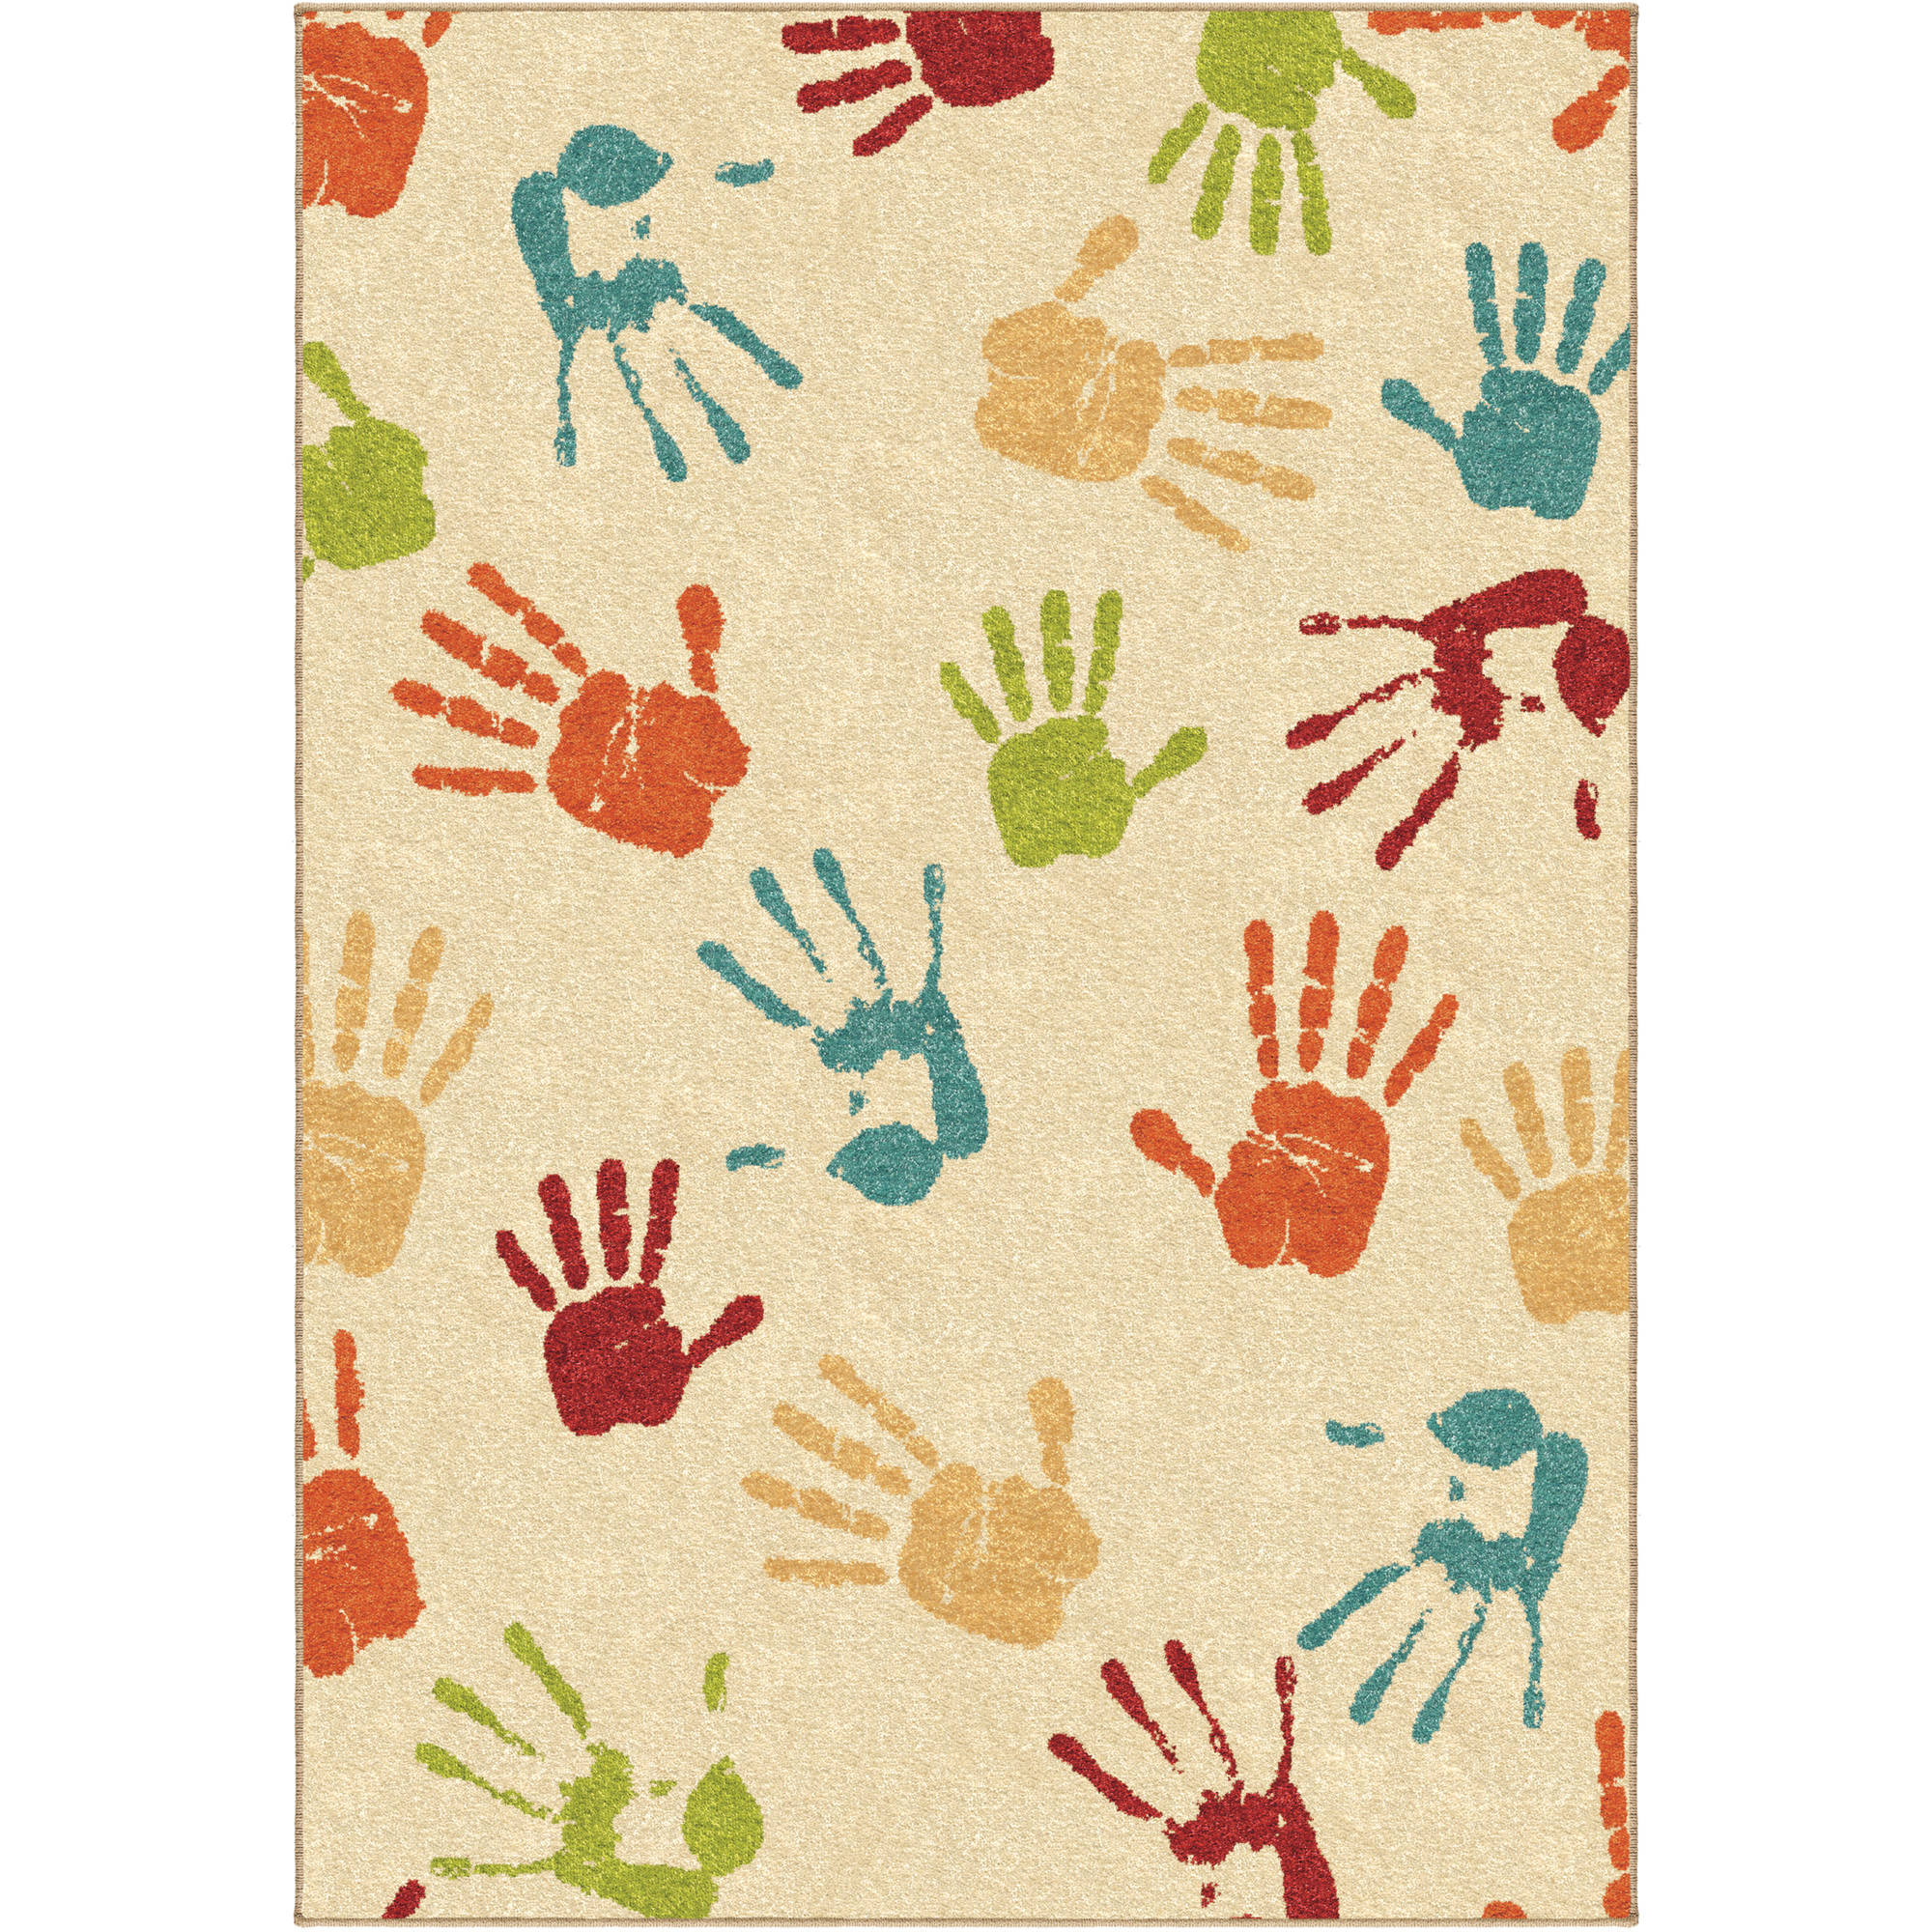 Orian Handprints Fun Kids' Area Rug